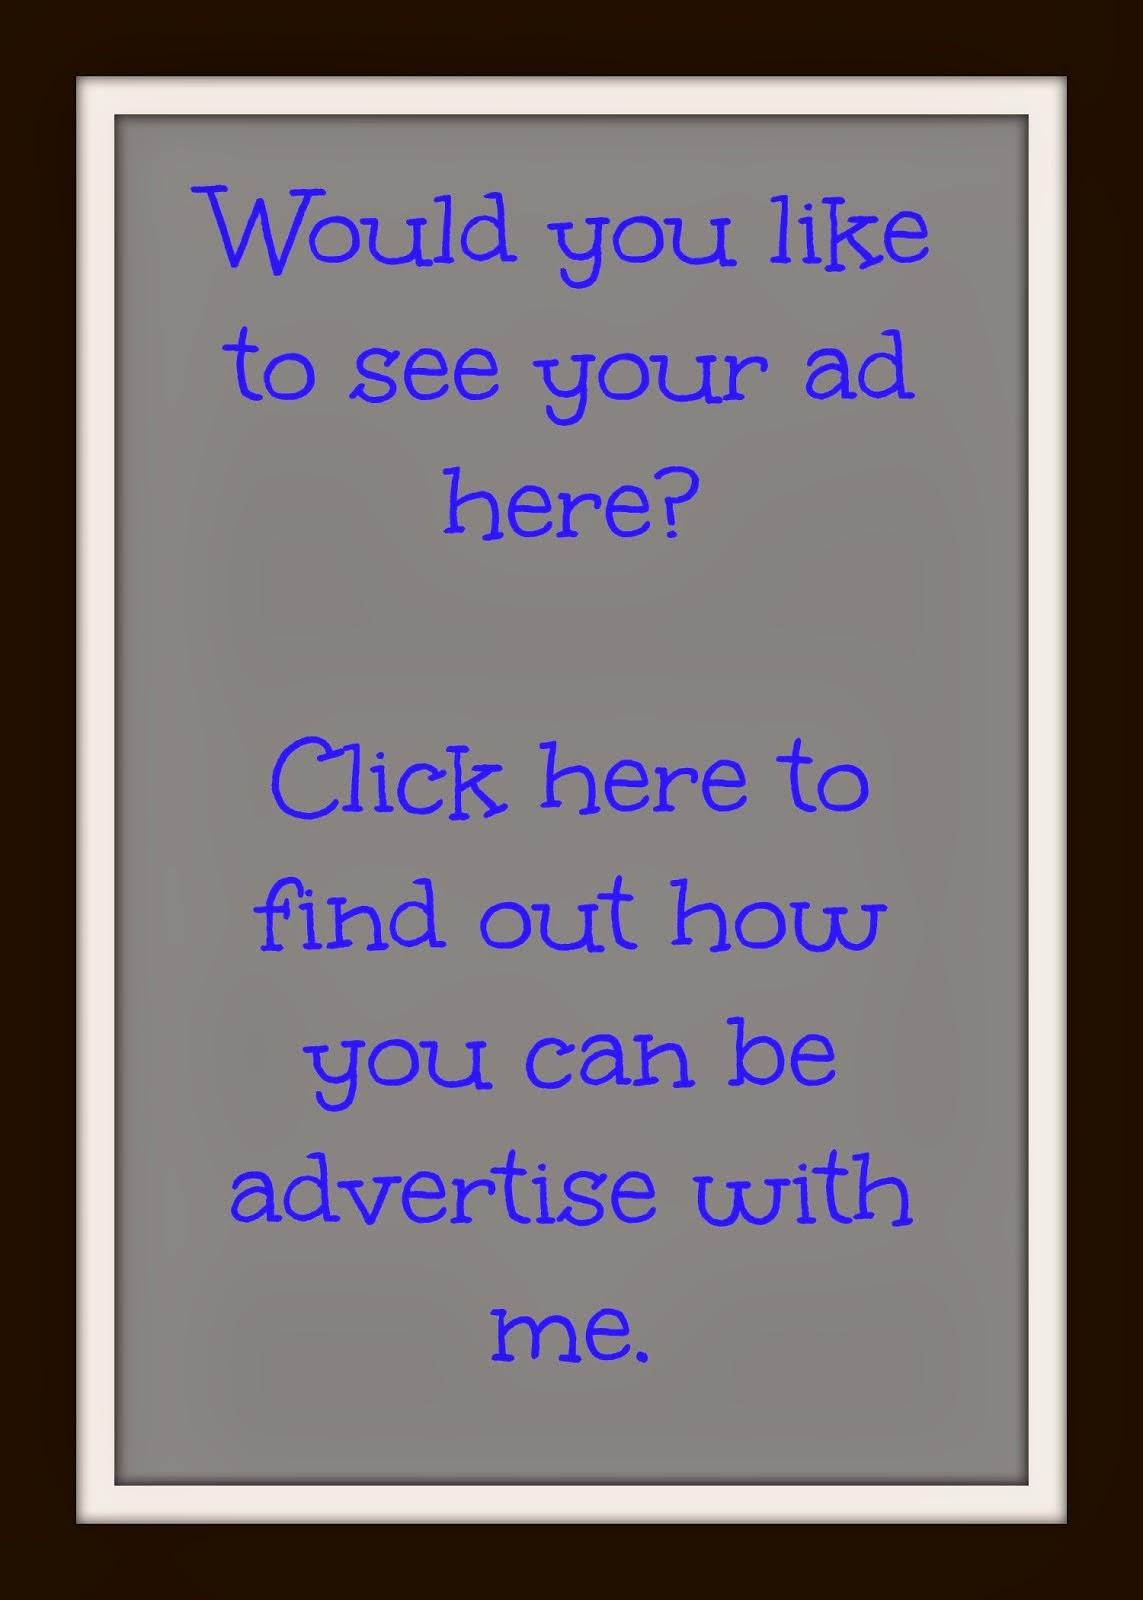 Advertise 2